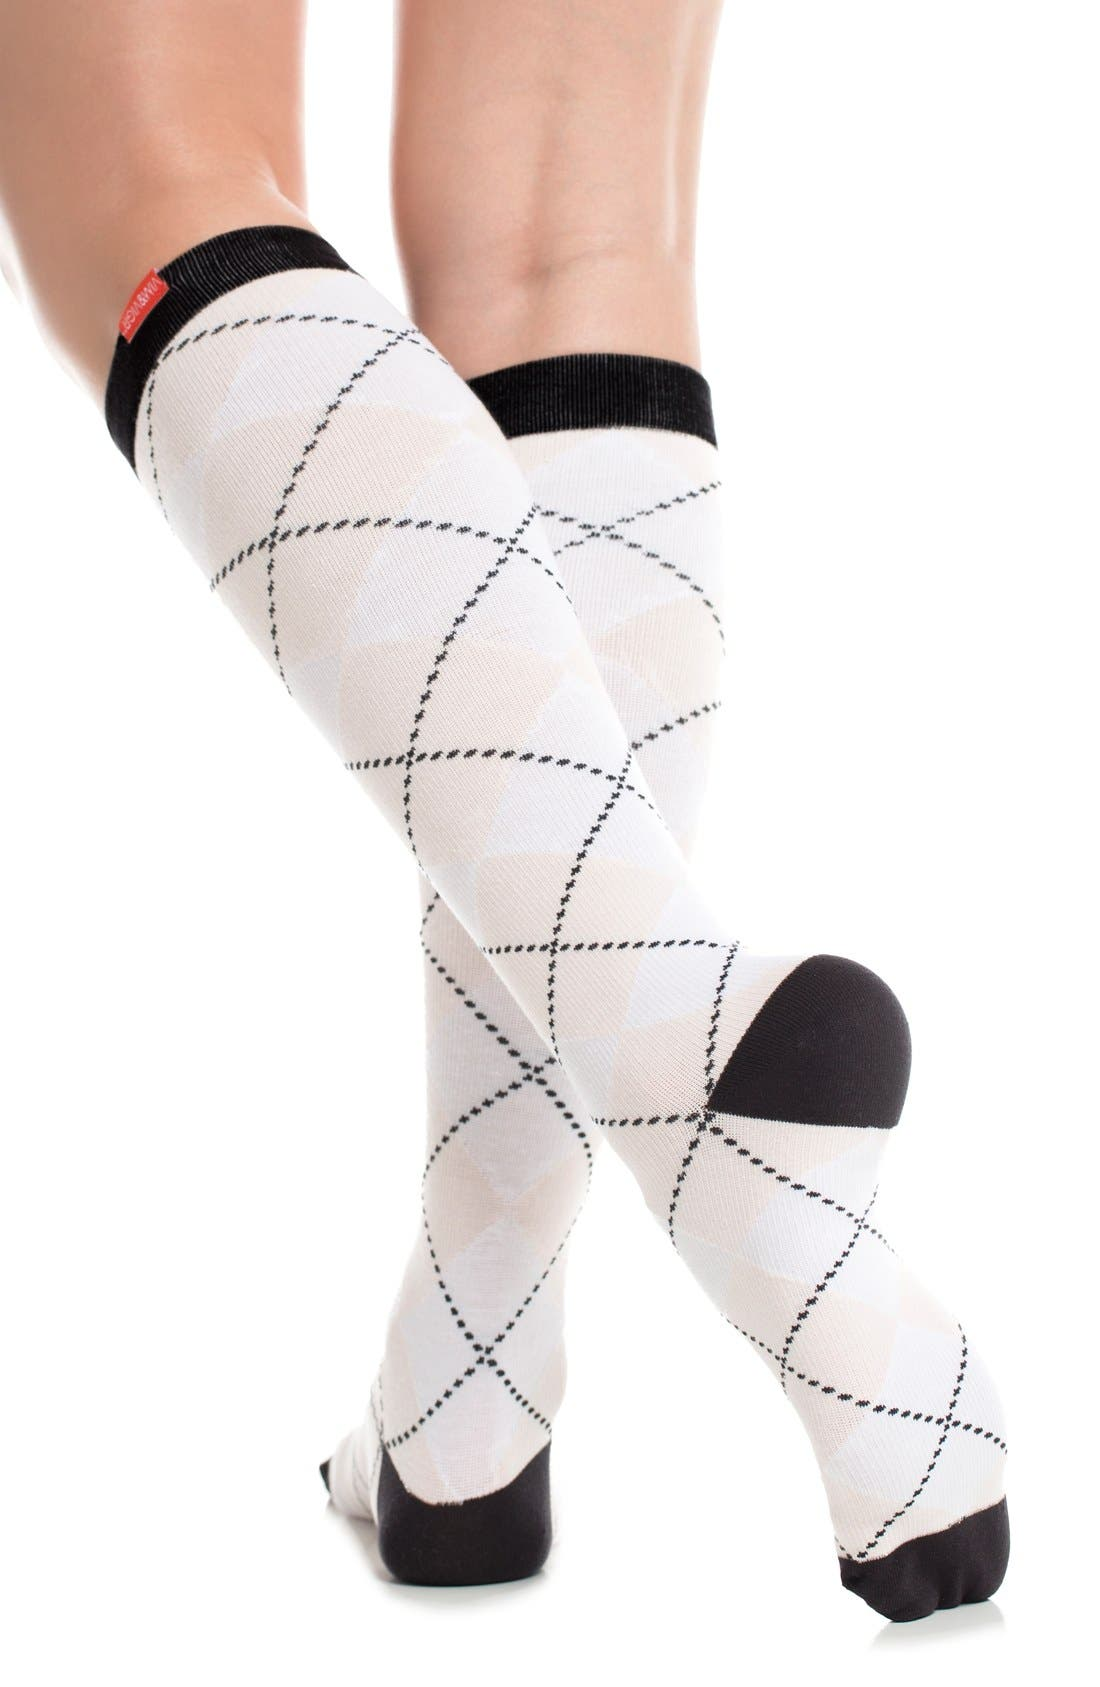 Alternate Image 3  - VIM & VIGR Argyle Graduated Compression Trouser Socks